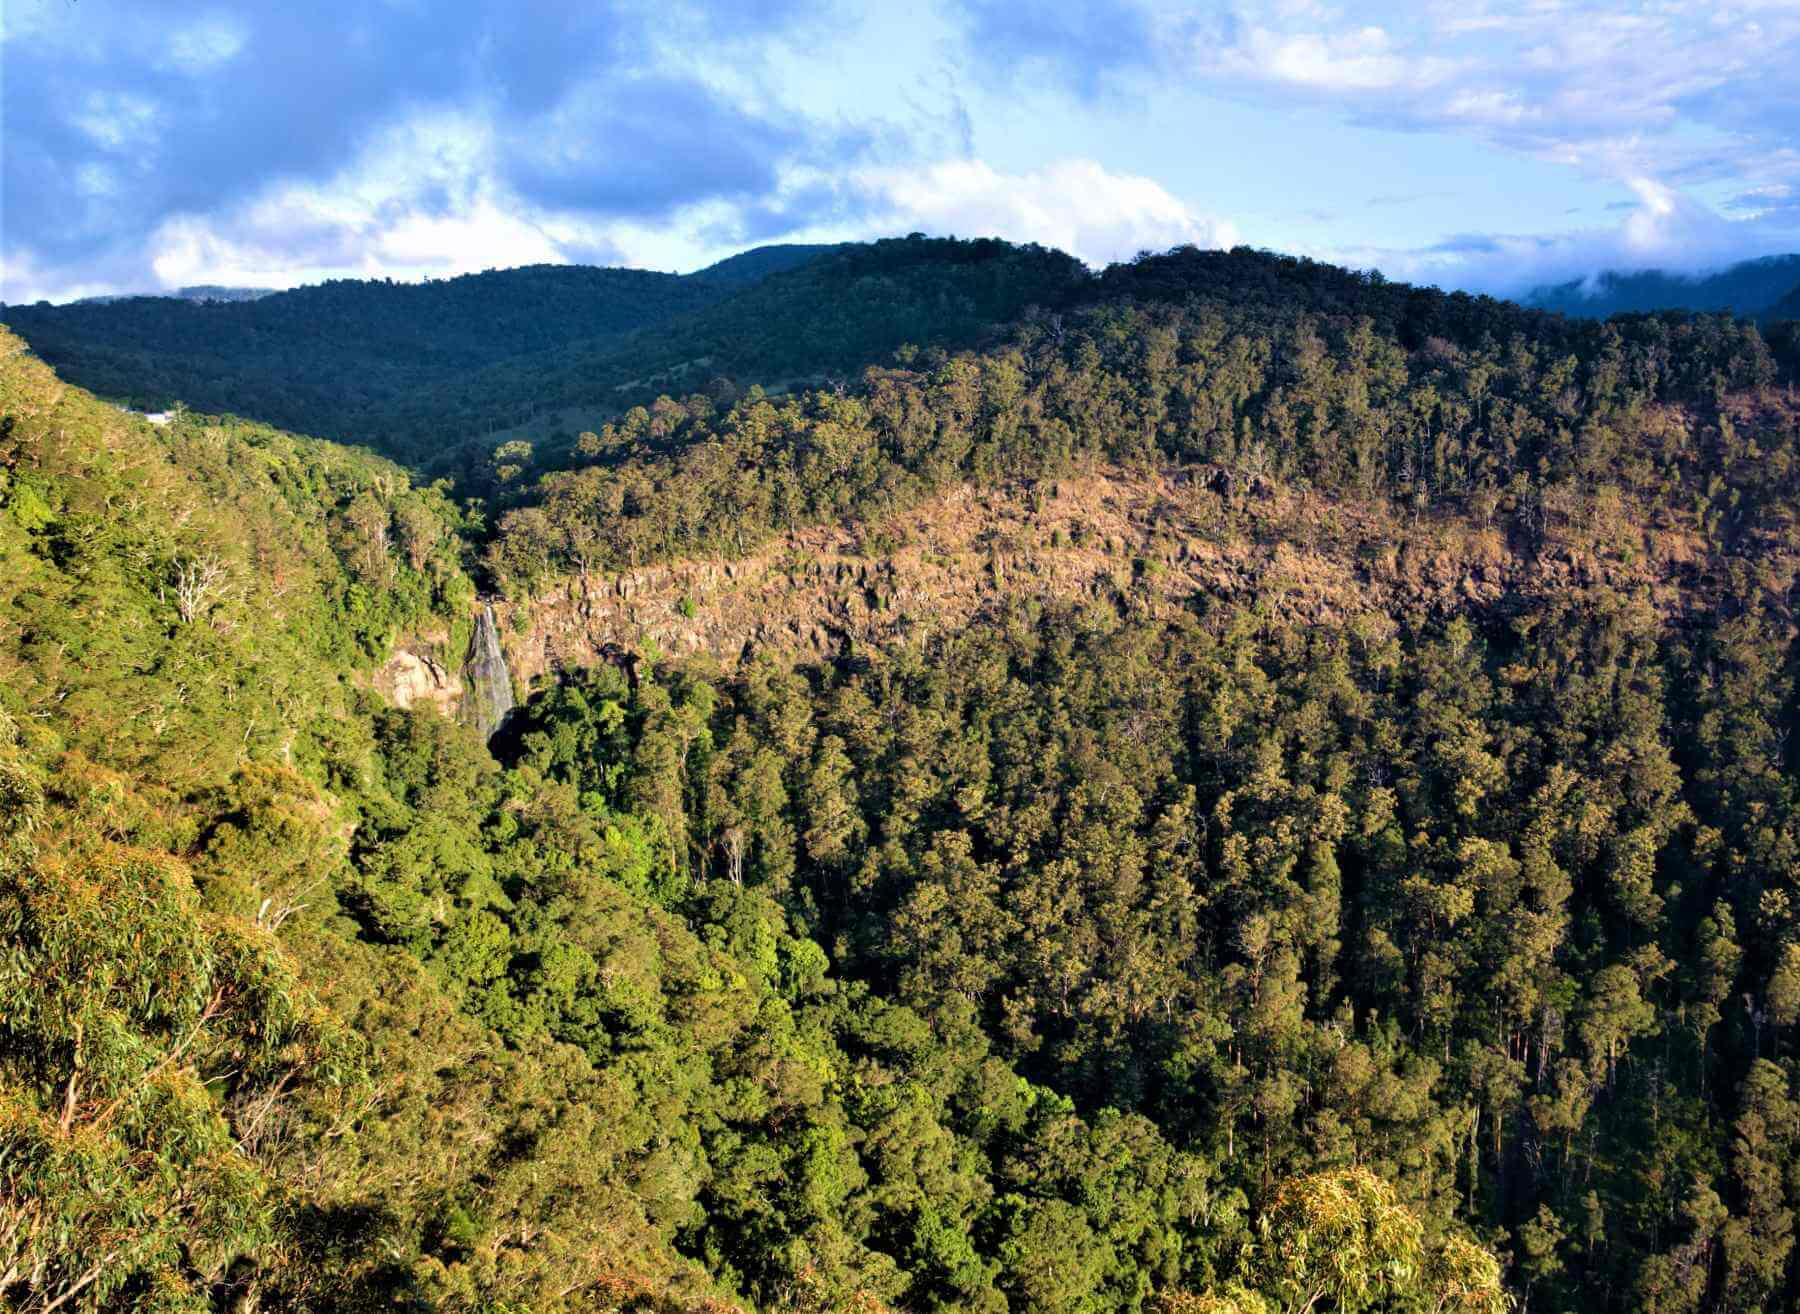 Blick auf den Lamington National Park in Australien